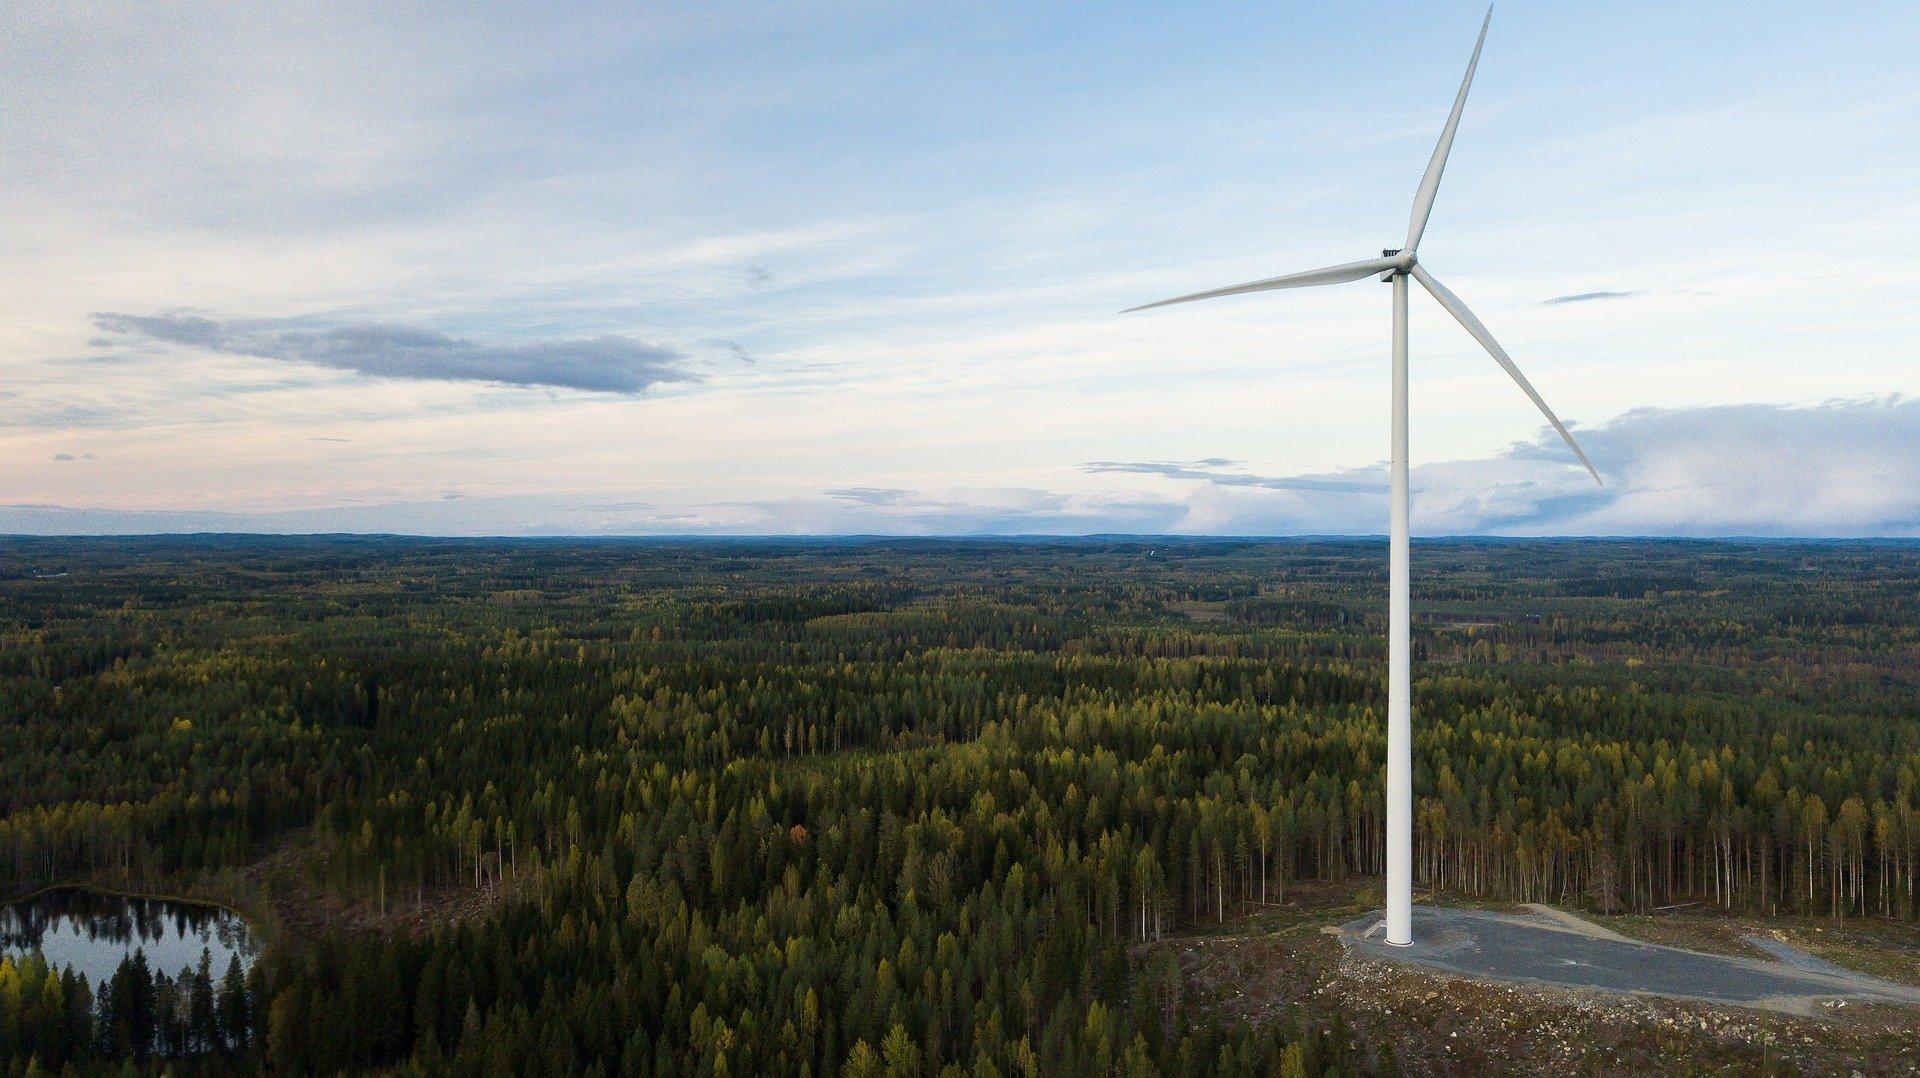 WCI Energia-alan-luottamus-kohentunut-2021-tuulivoima-tuuli-turbiini